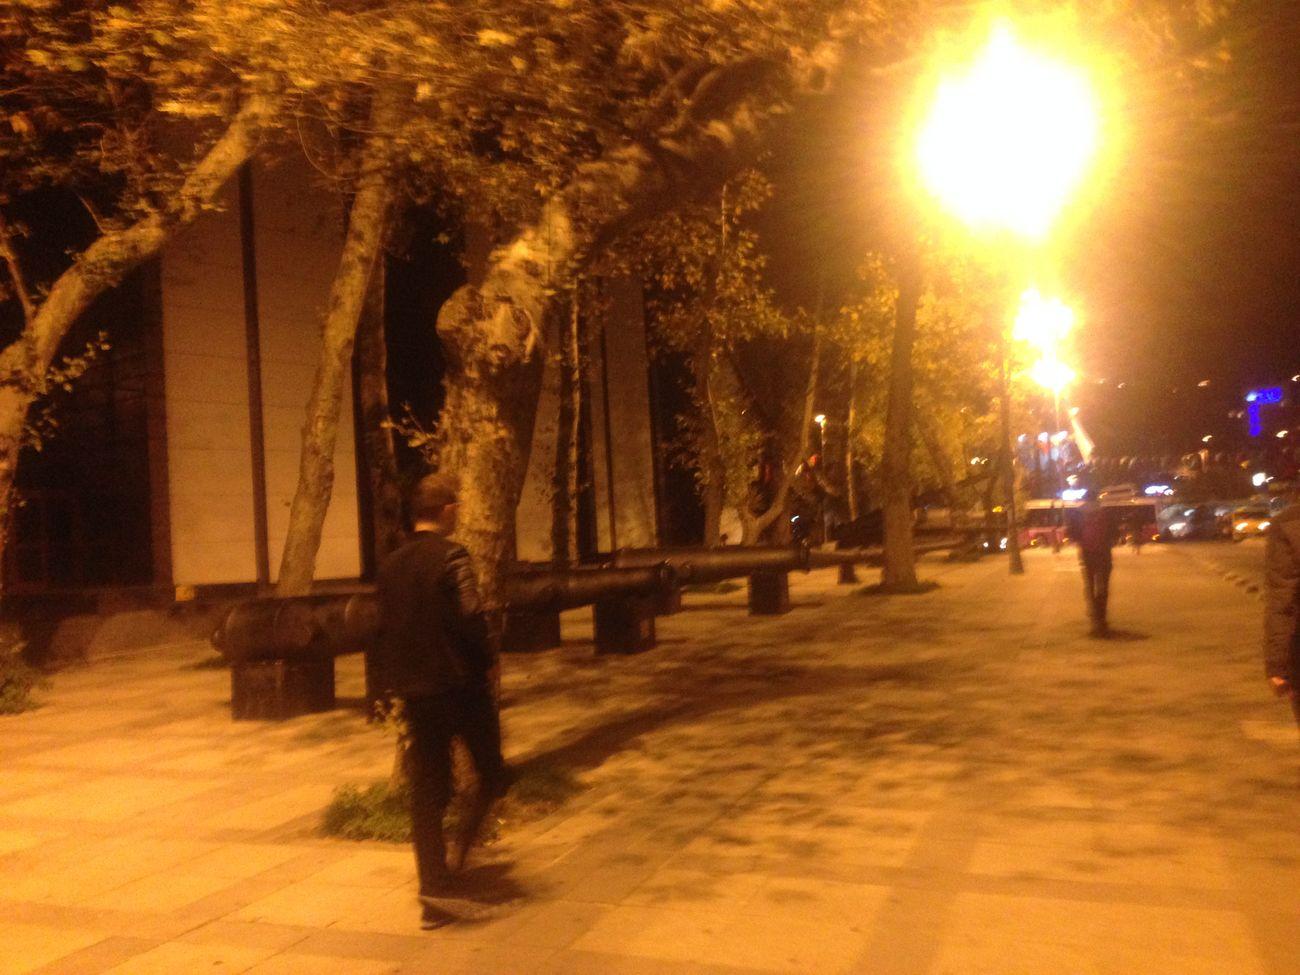 Street Walk Througt To Light